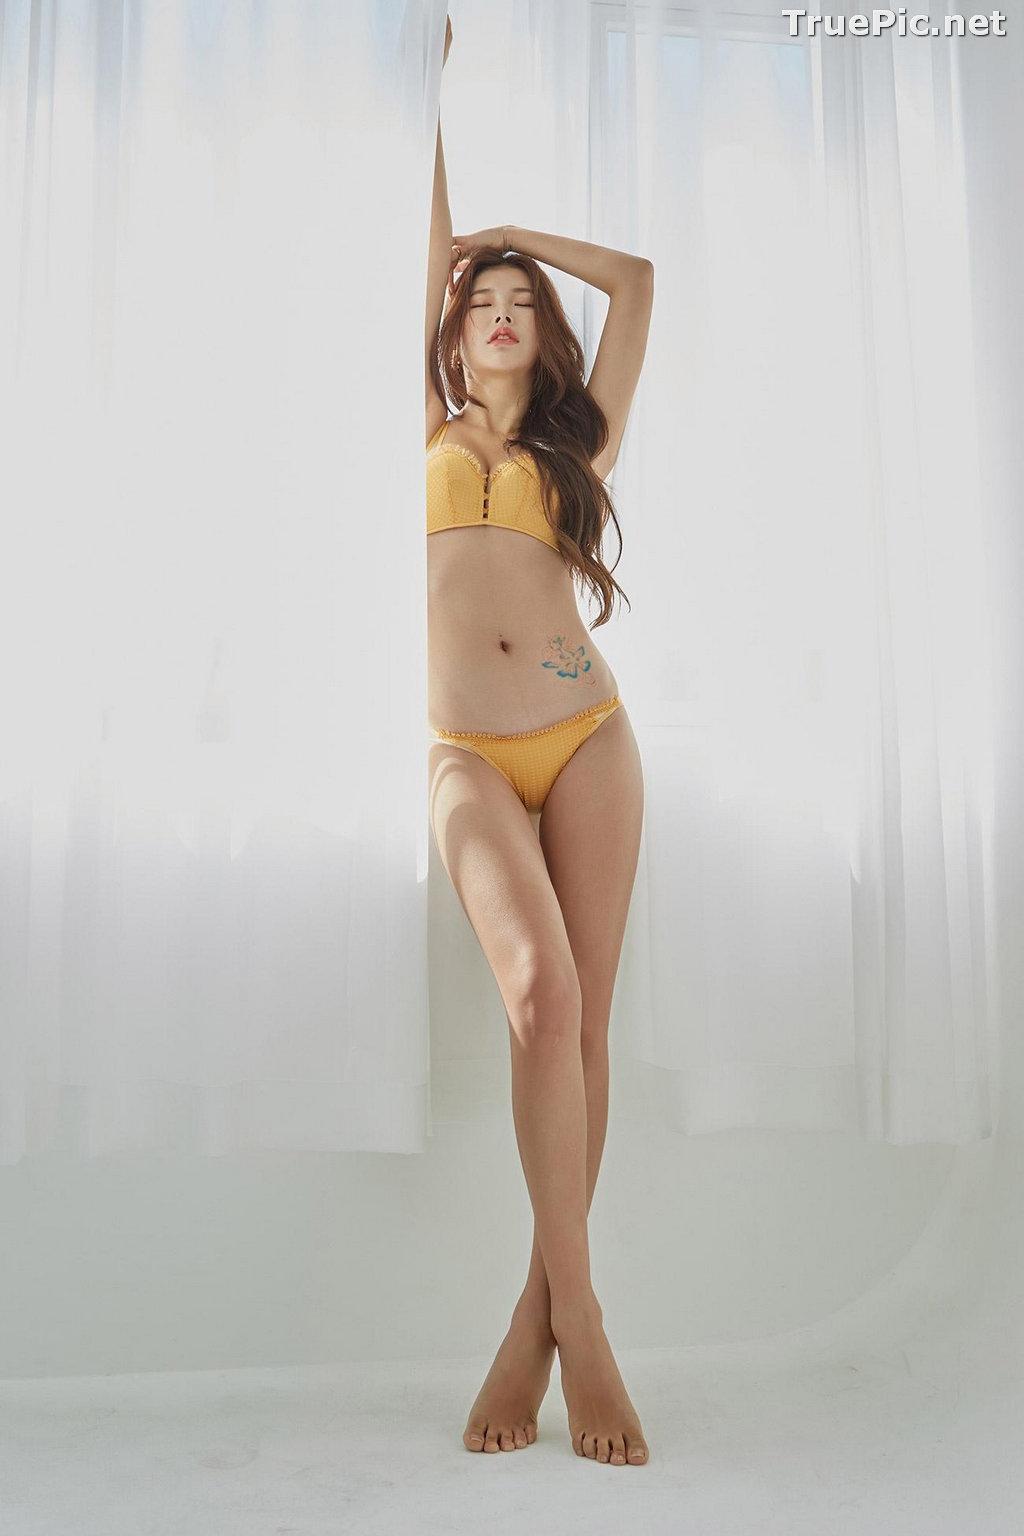 Image Korean Fashion Model – Da Yomi (다요미) – Lountess Spring Lingerie #3 - TruePic.net - Picture-8